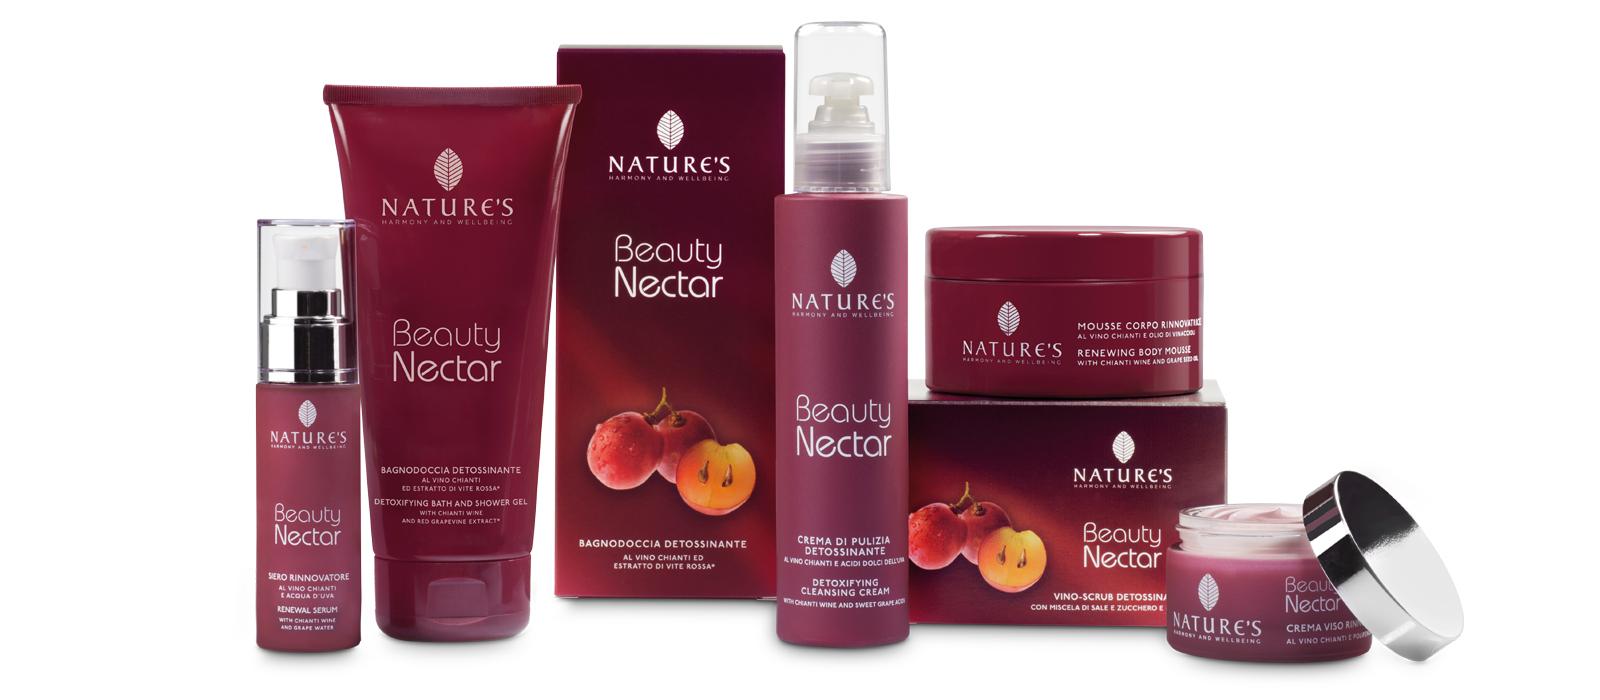 Beauty-Nectar-Natures